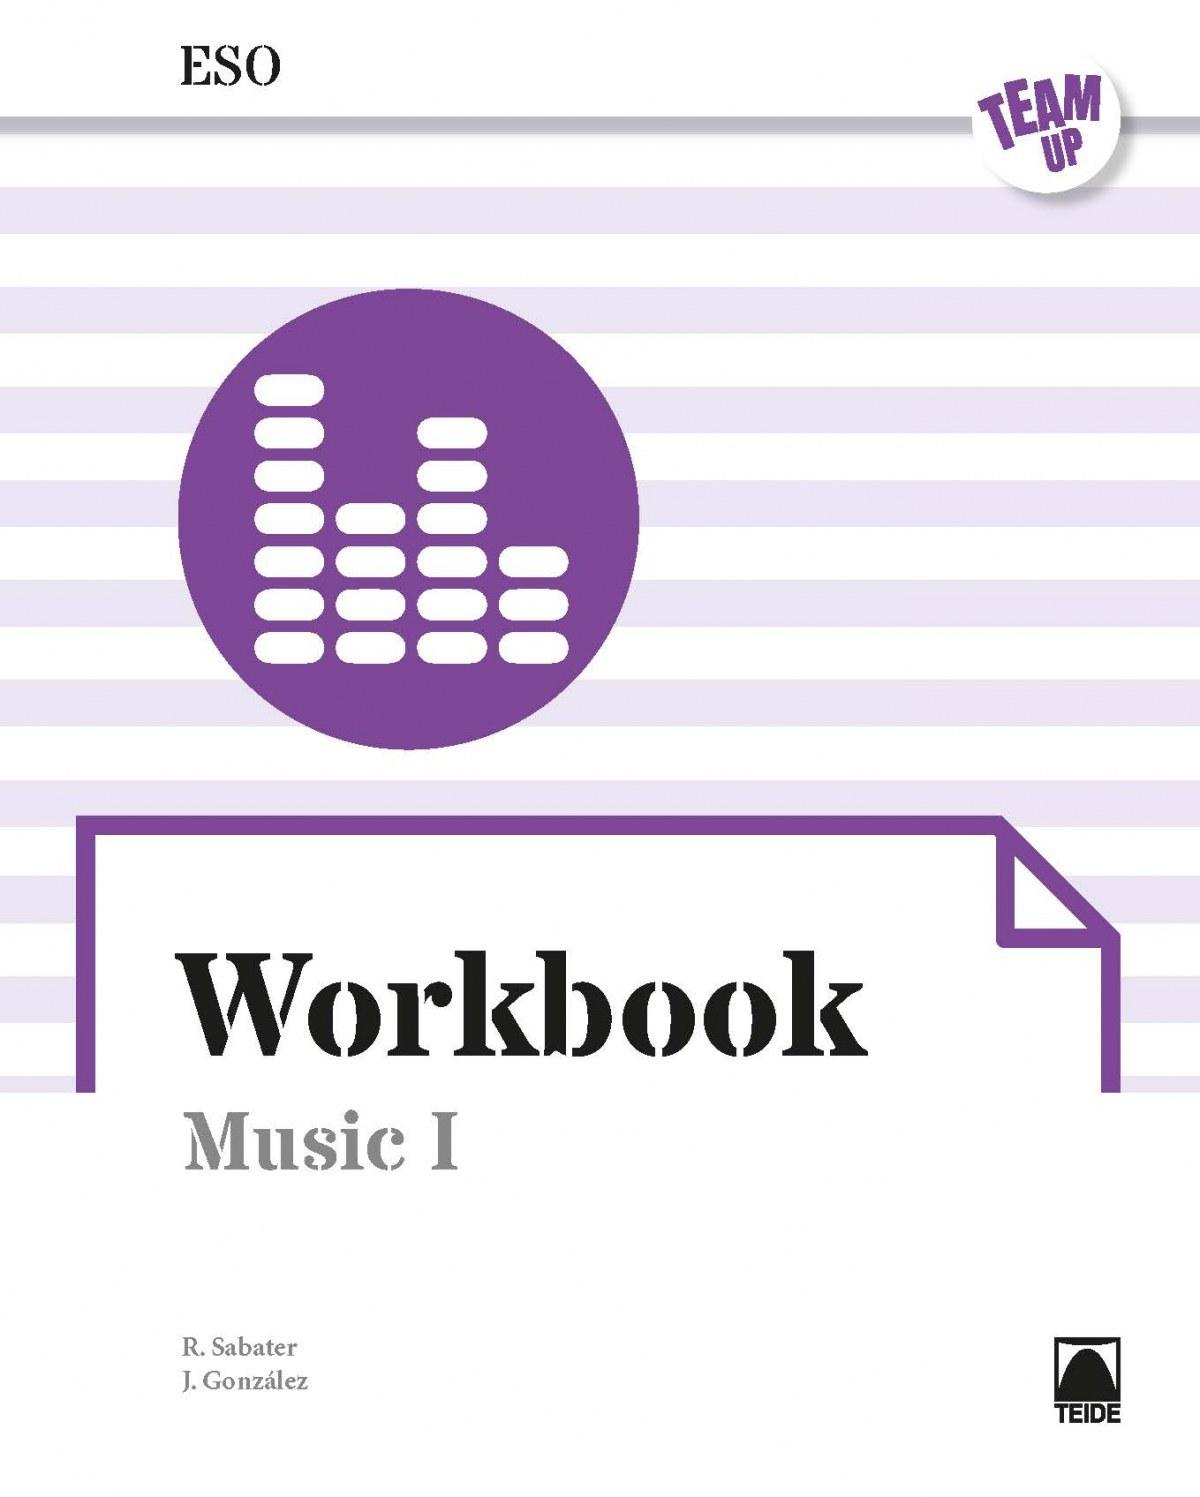 Team UP. Workbook Music I ESO (ENGLISH)